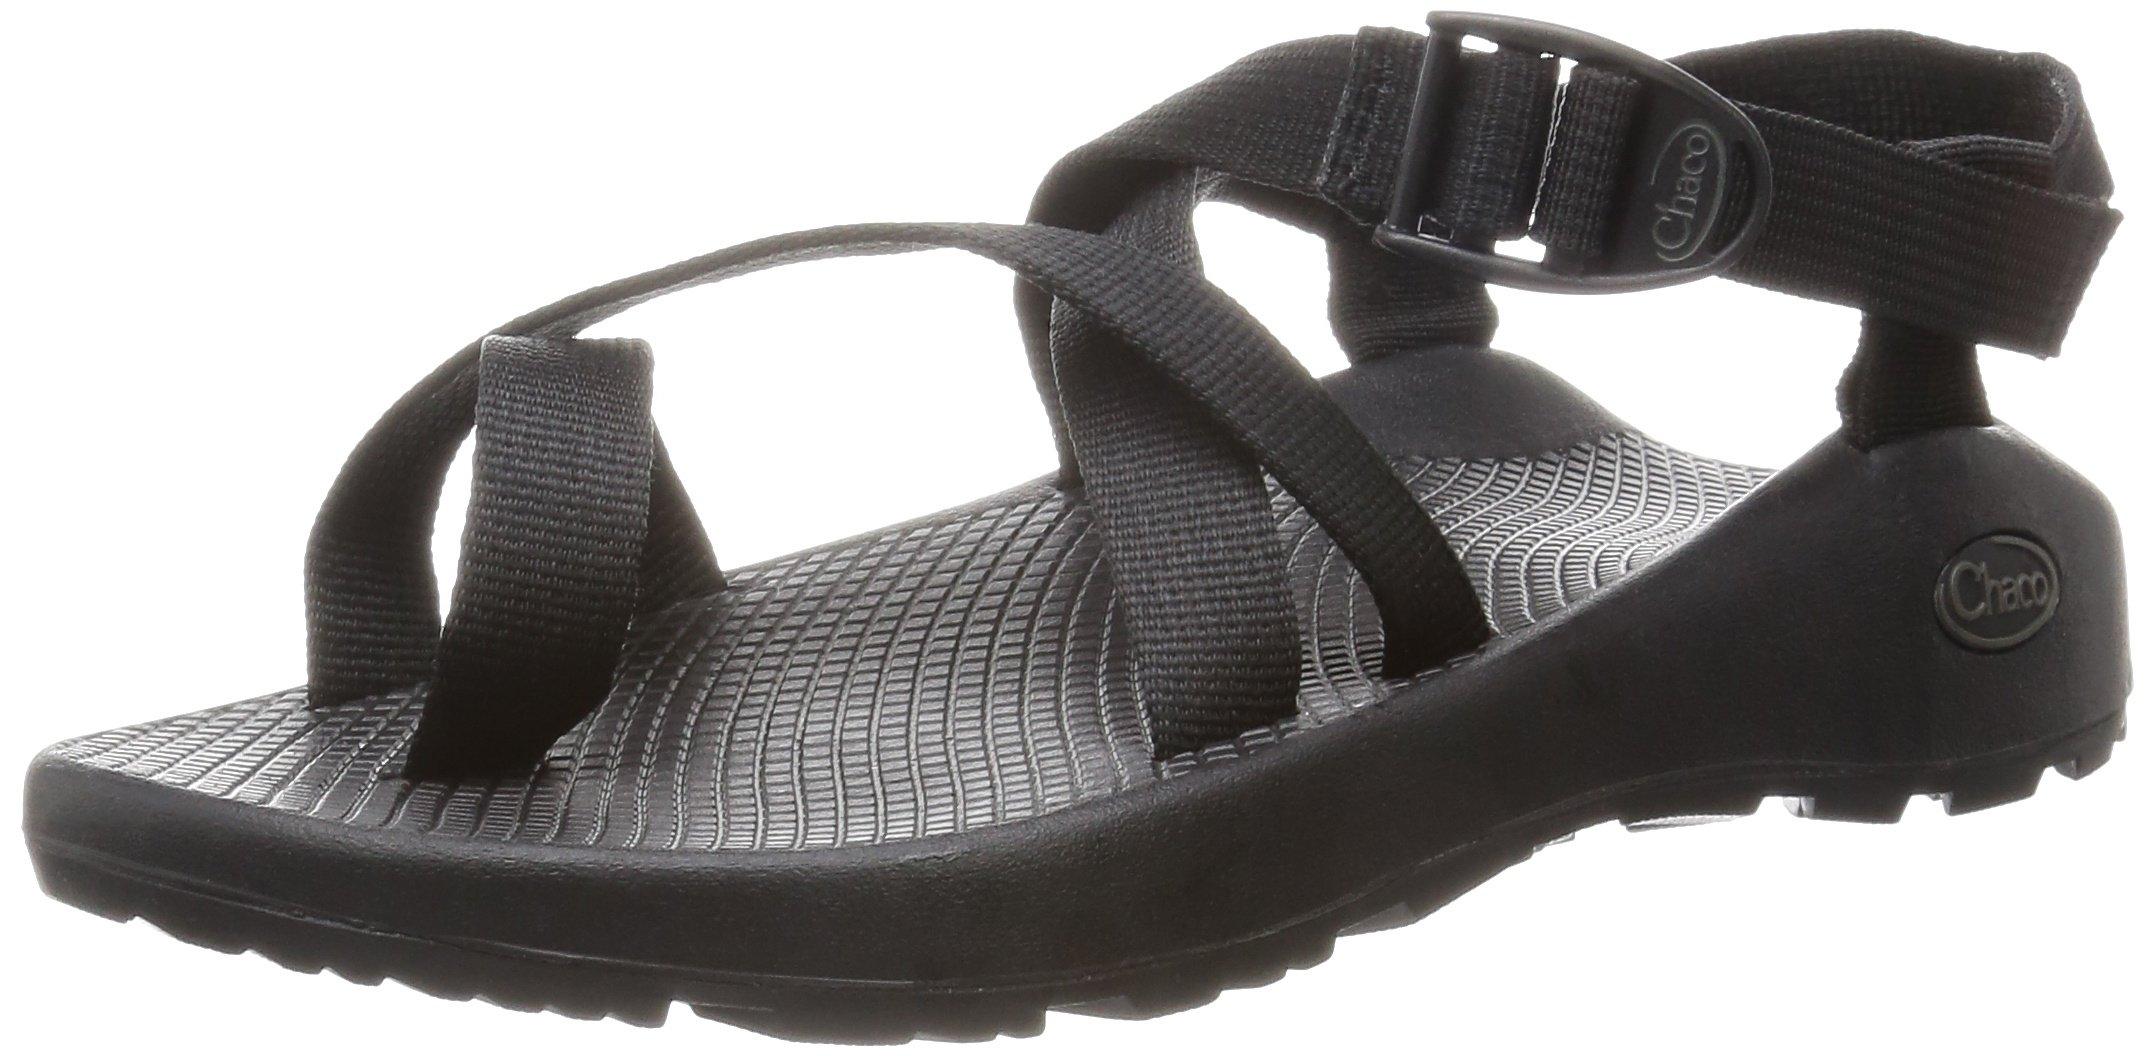 Chaco Men's Z2 Classic Sport Sandal, Black, 10 M US